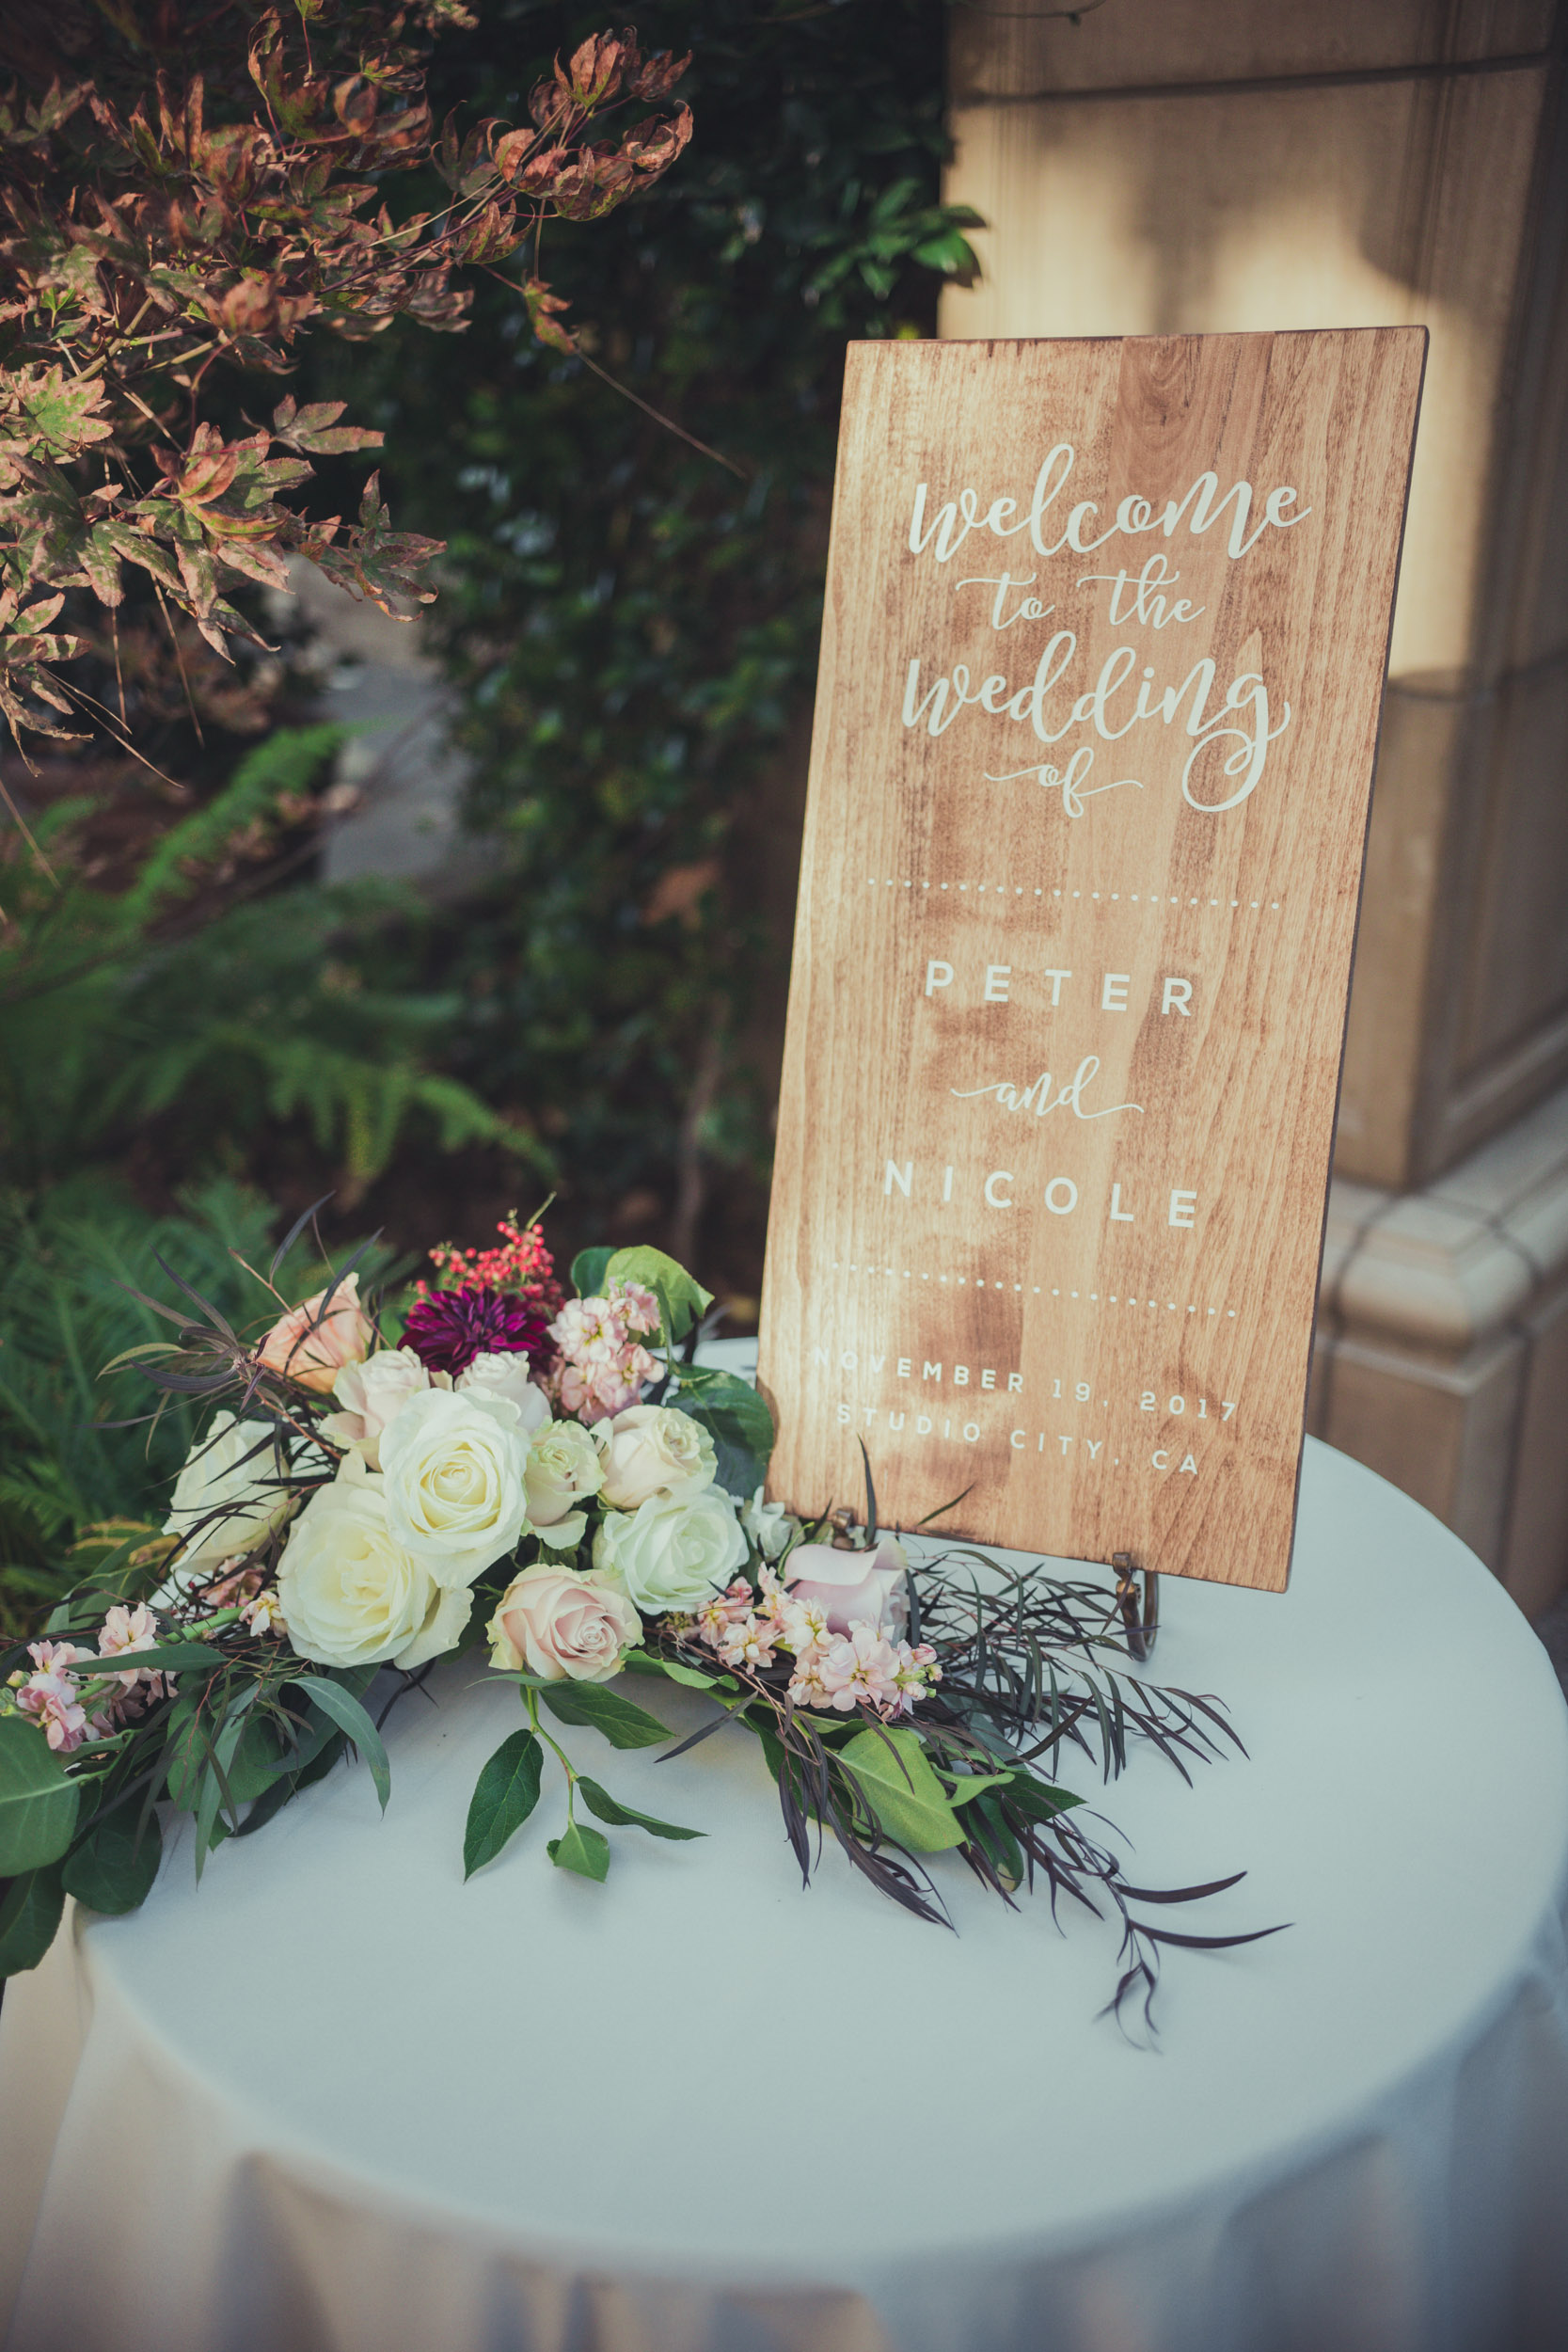 THE WEDDING OF PETER & NICOLE-153.jpg